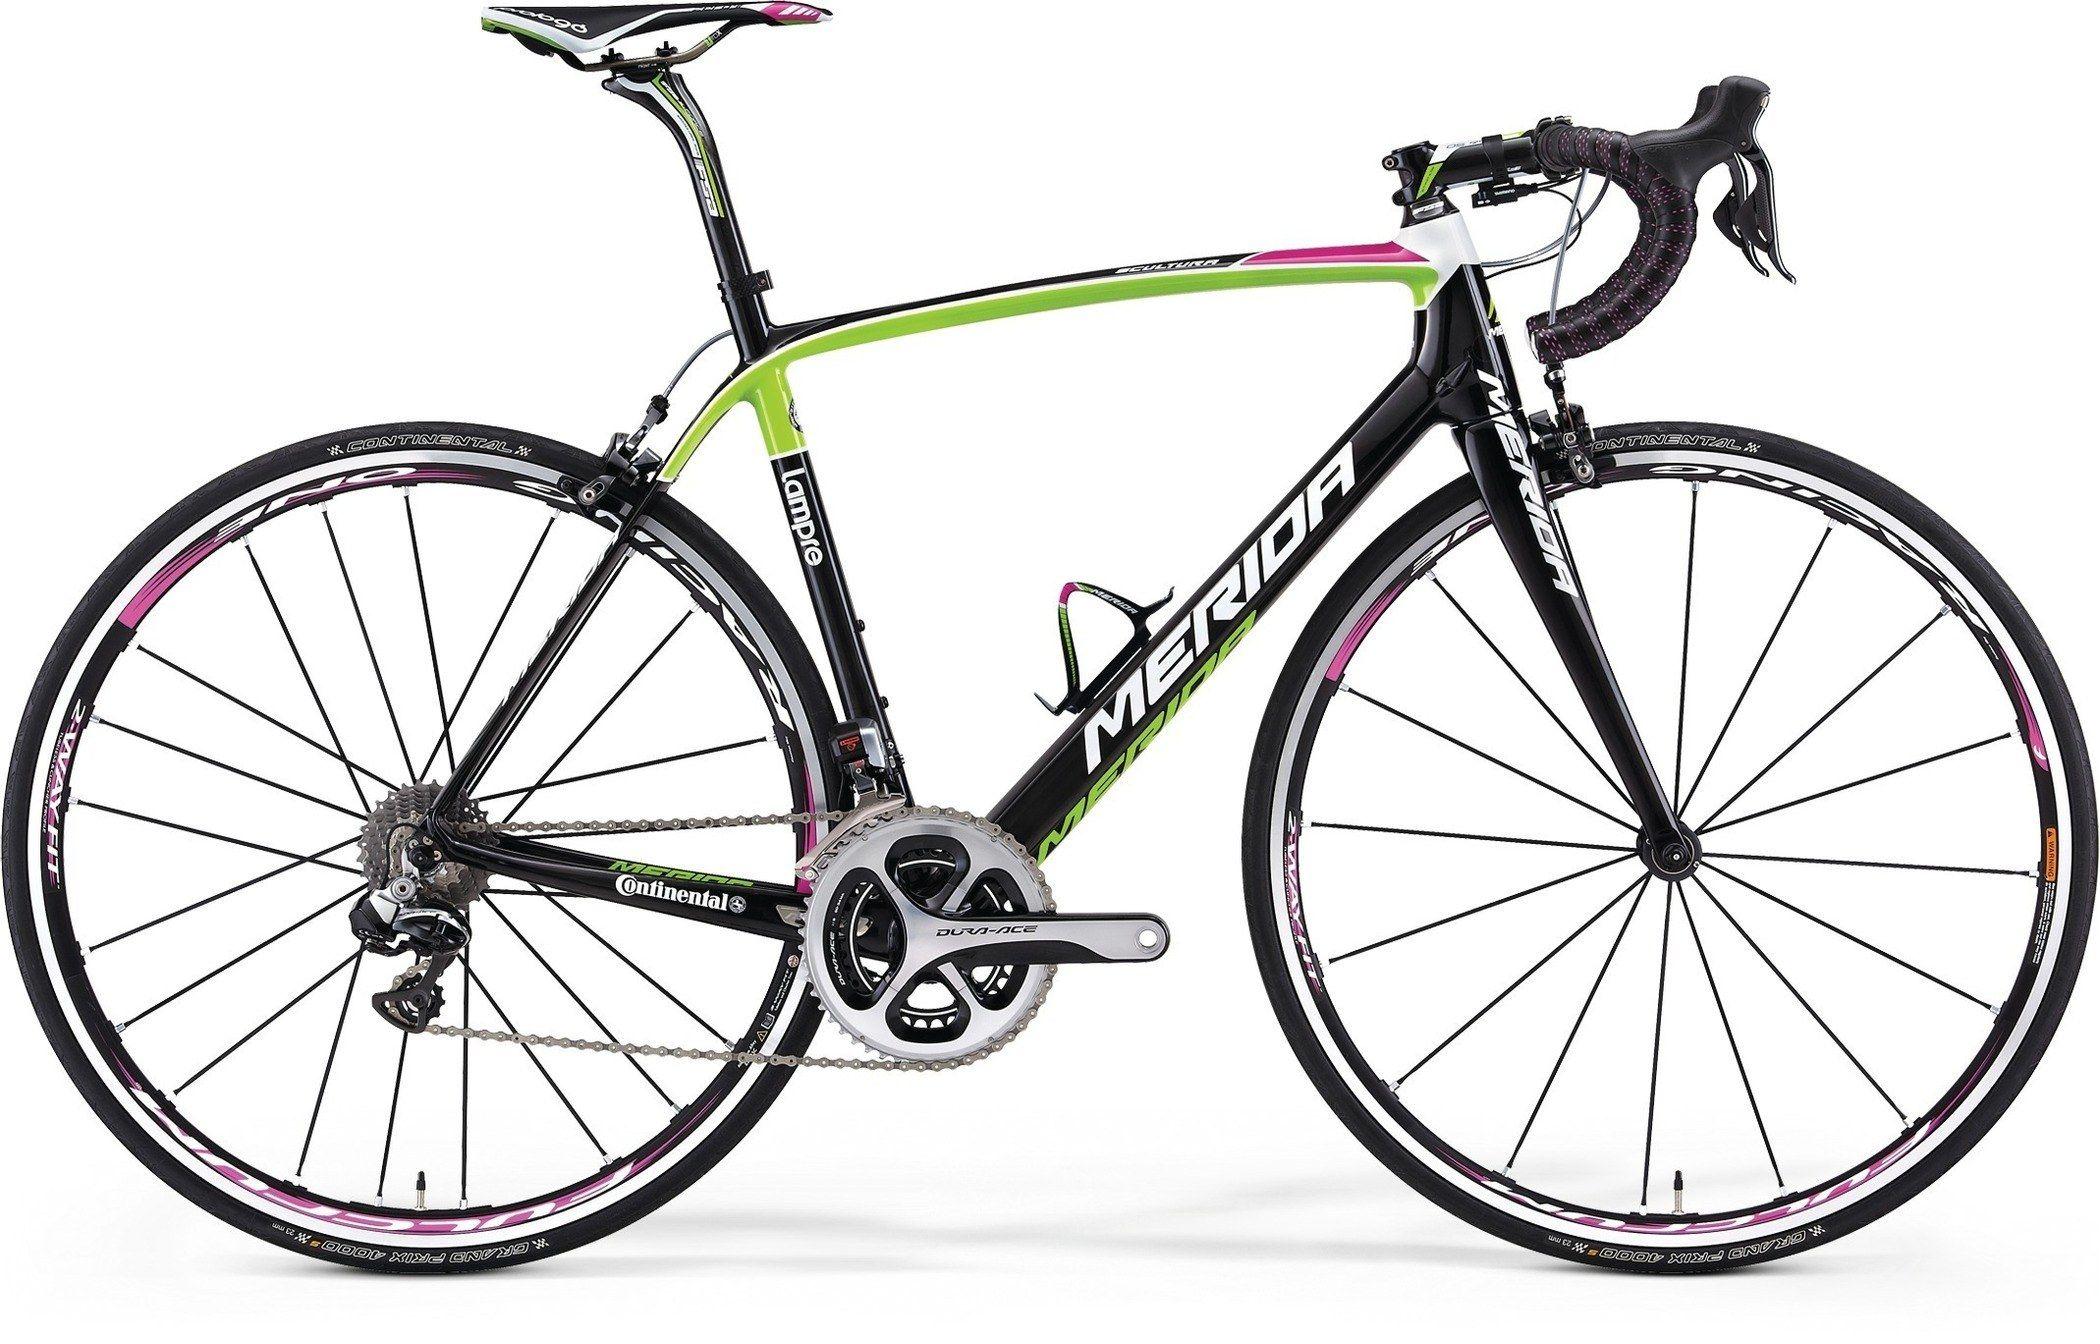 Bicicleta Merida Scultura CF Team E 2014 #bikestocks #bikes #meridabikes #scultura